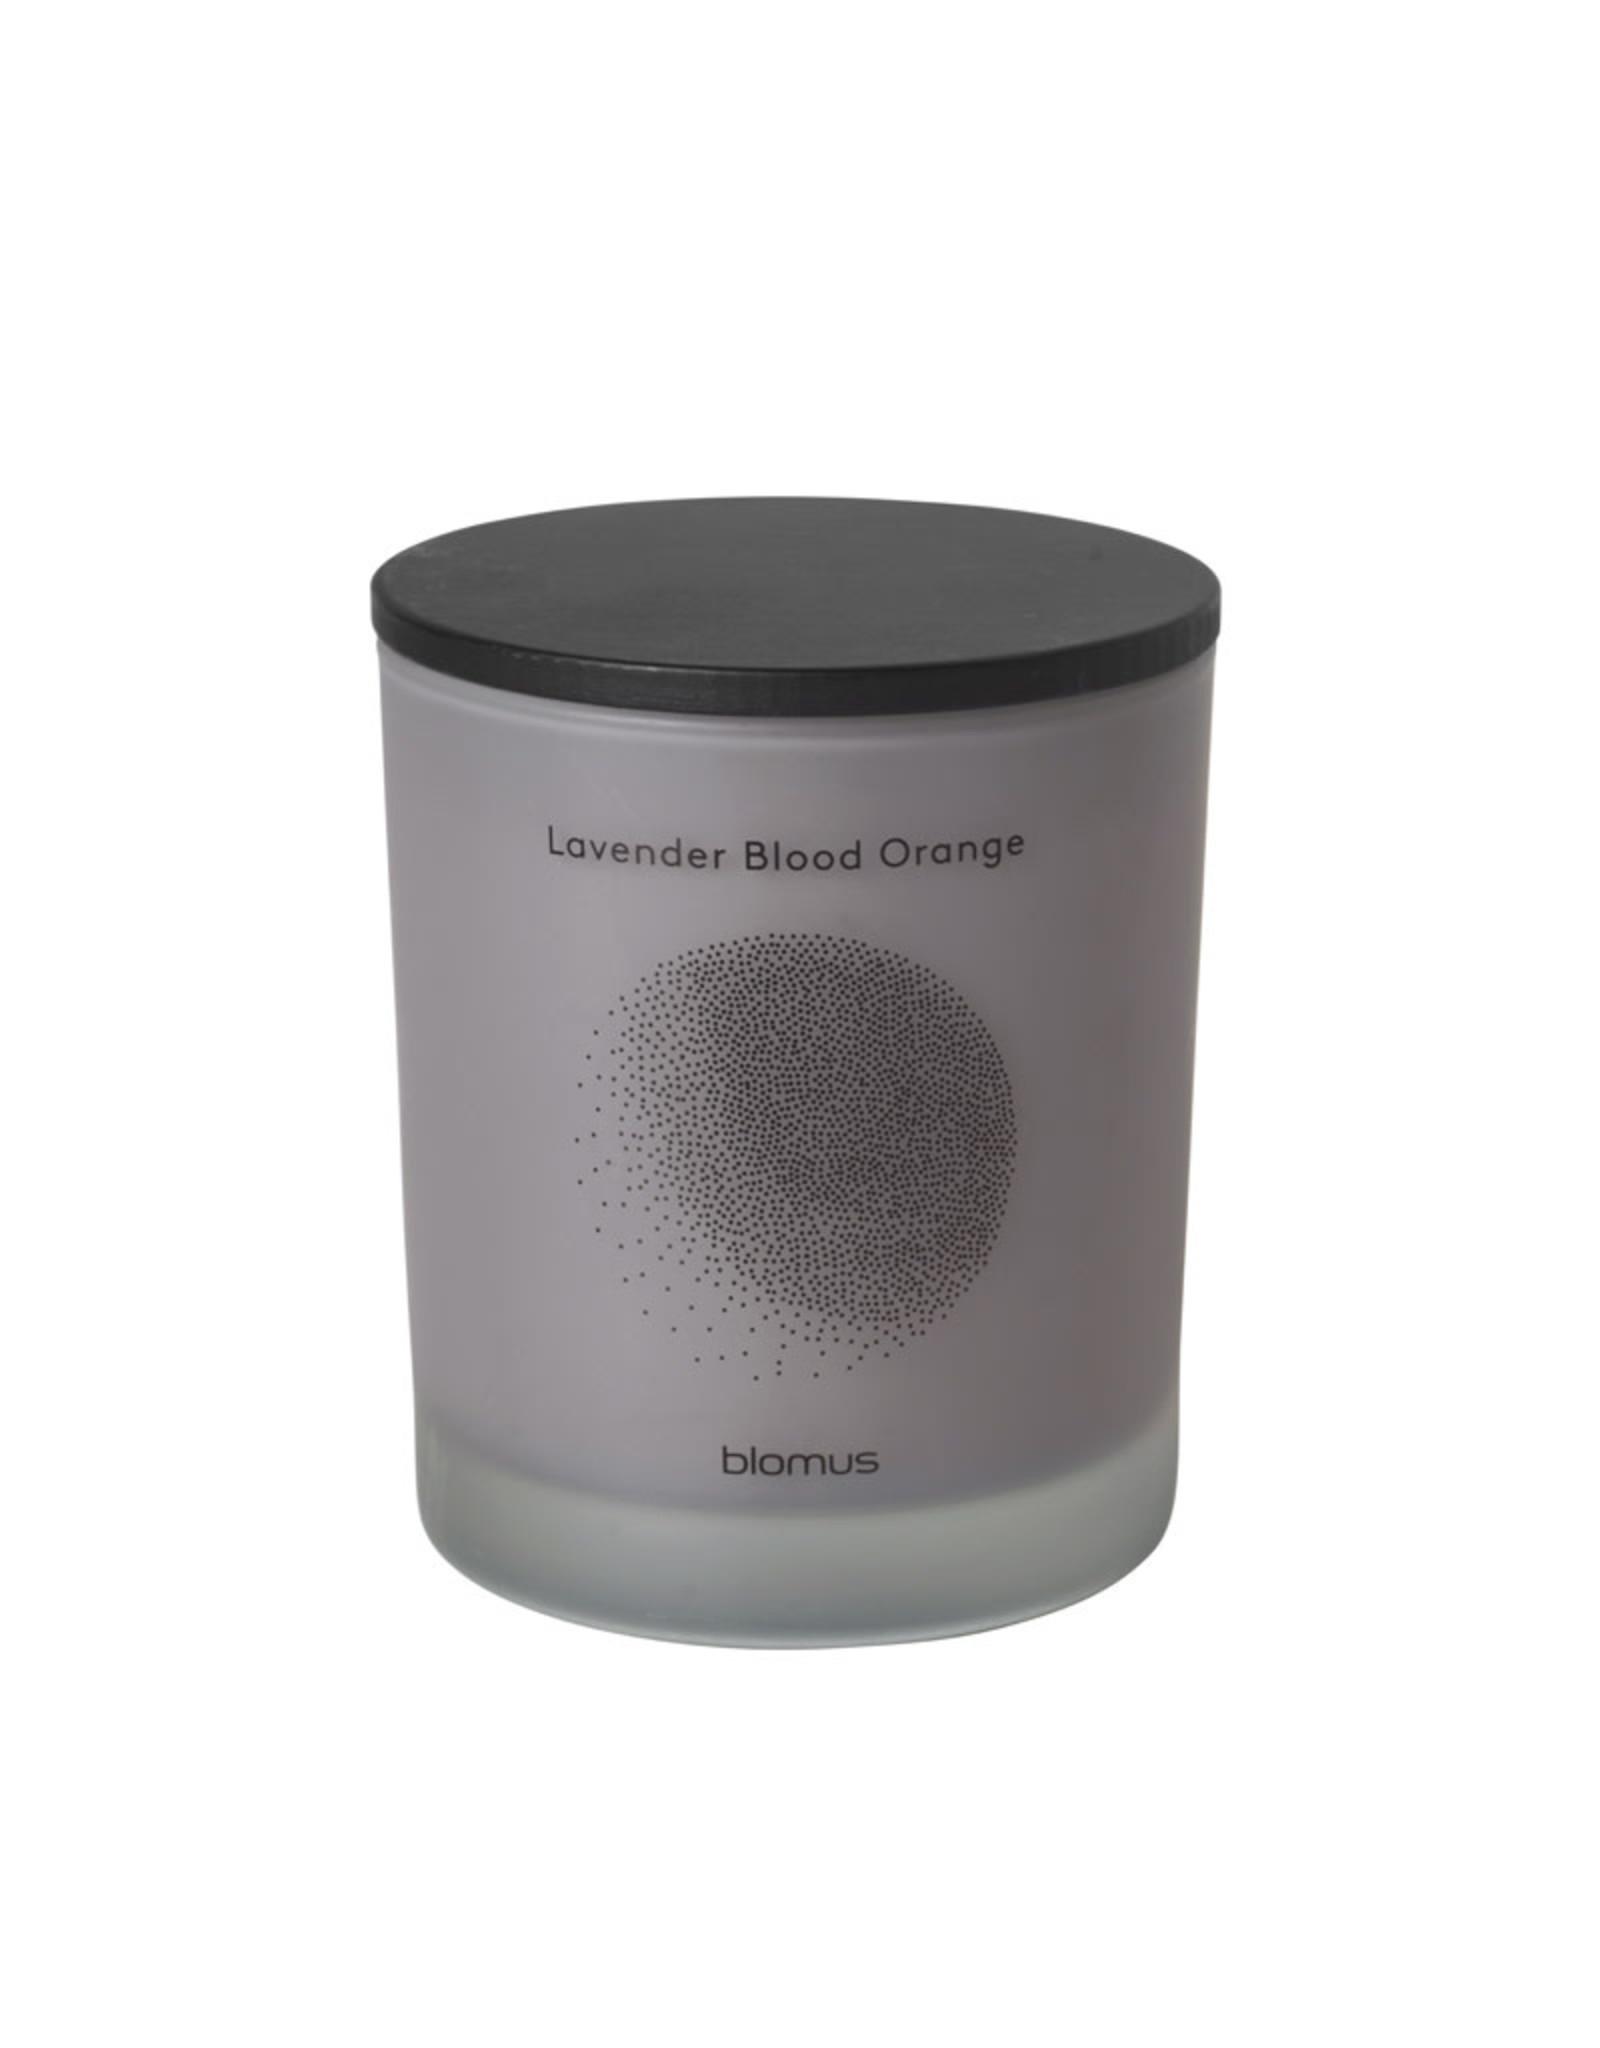 BLOMUS BLOMUS FLAVO SCENTED CANDLE LARGE LAVENDER BLOOD ORANGE